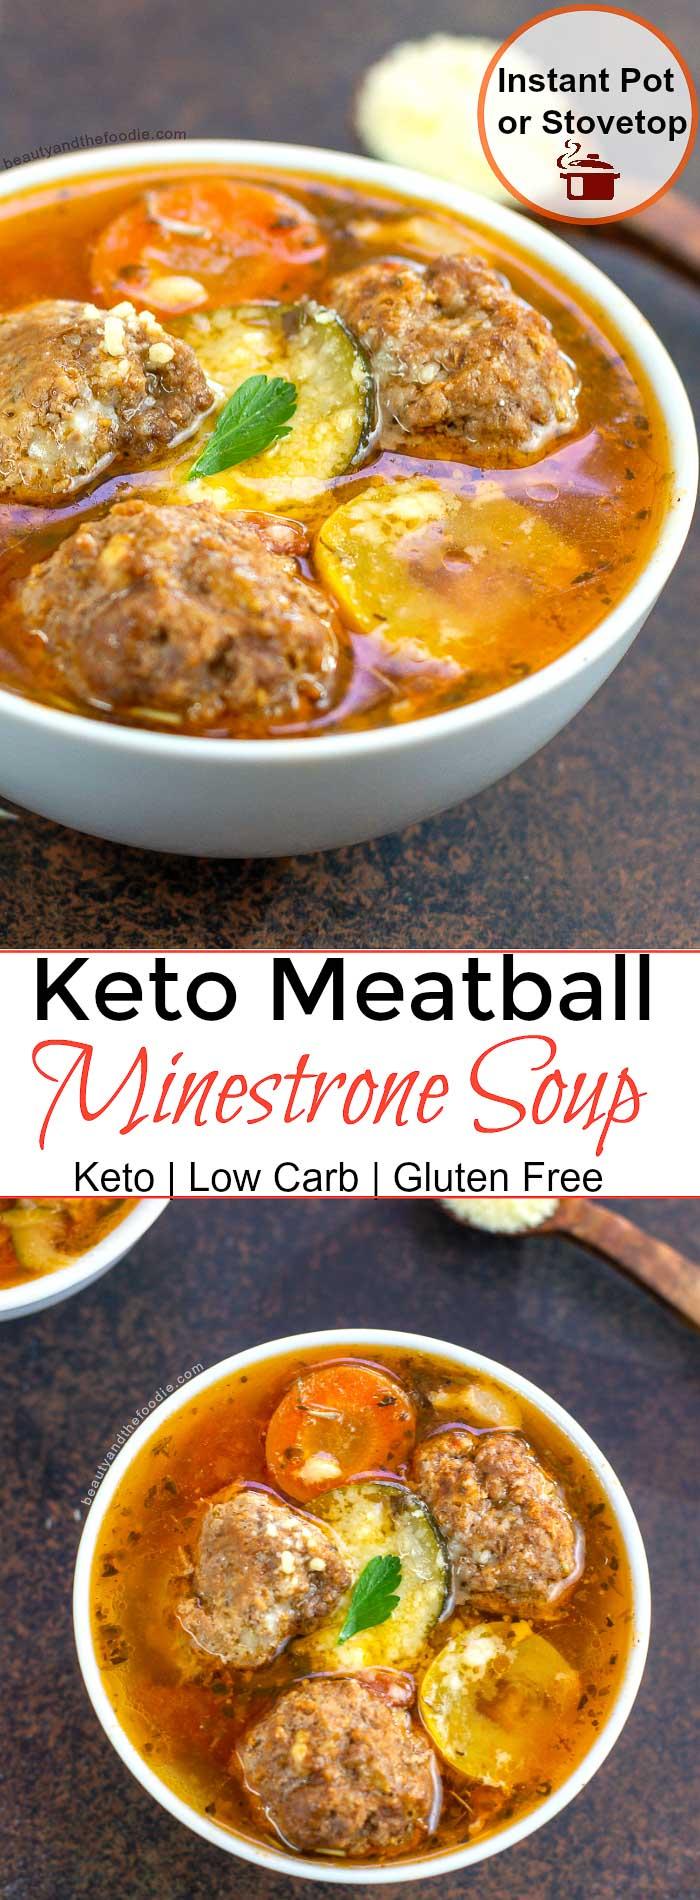 Keto Meatball Minestrone Beauty and the Foodie Keto